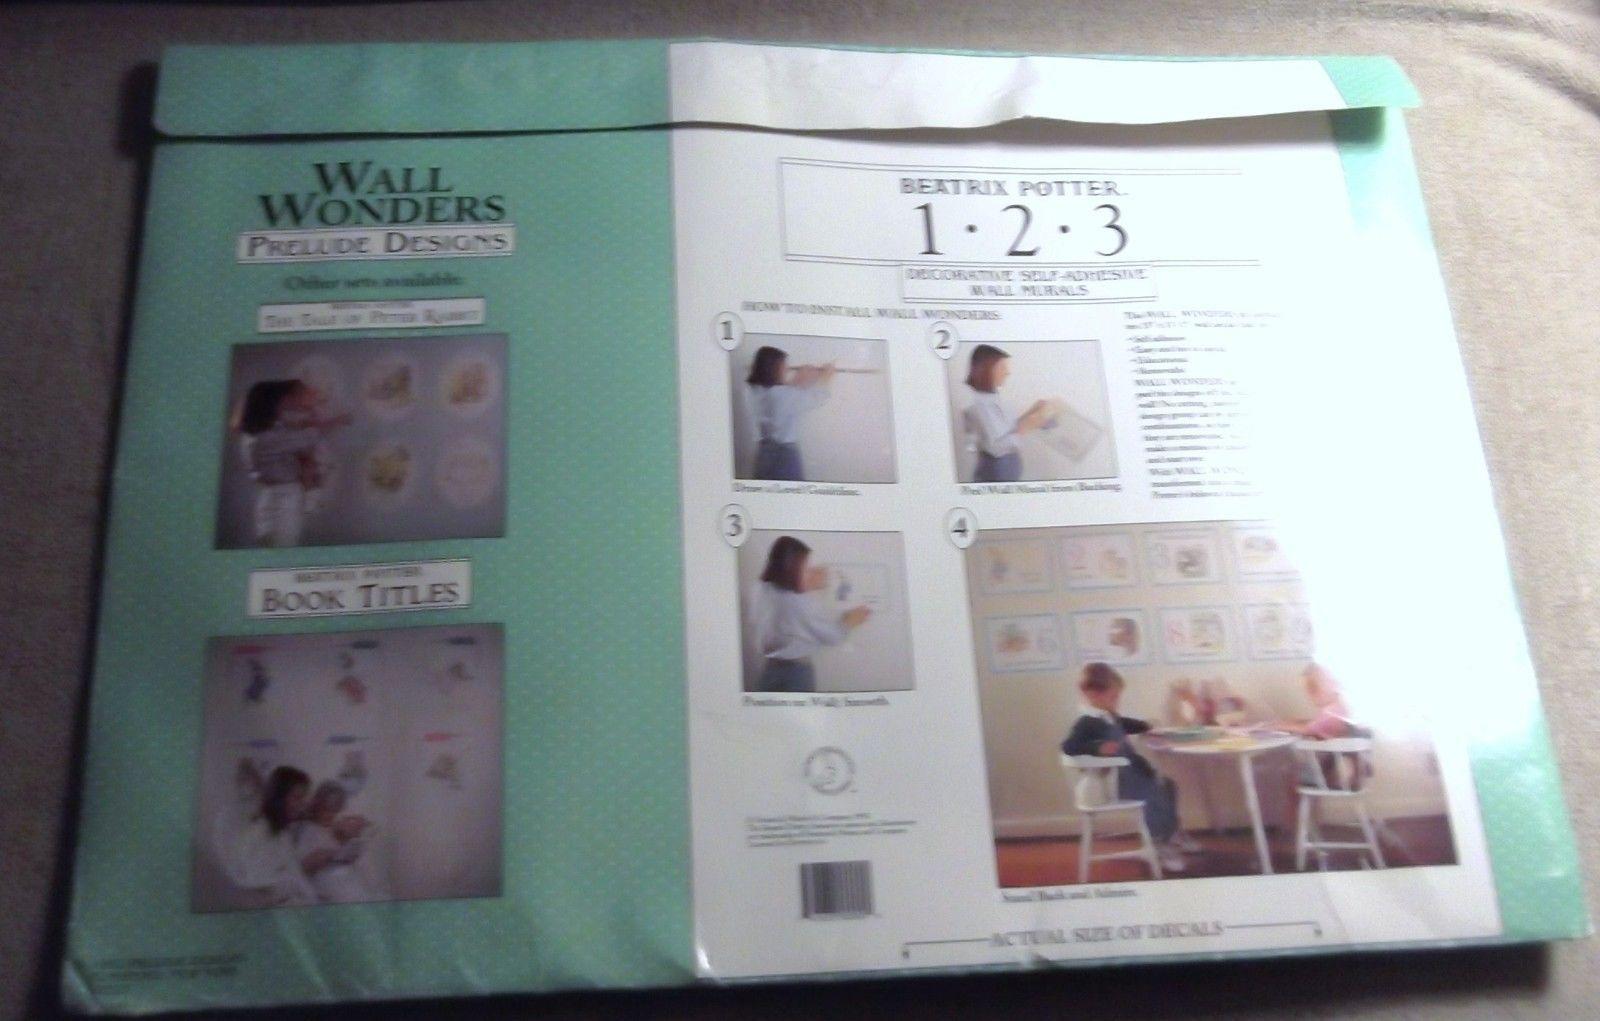 Wall Wonders Beatrix Potter 1.2.3.